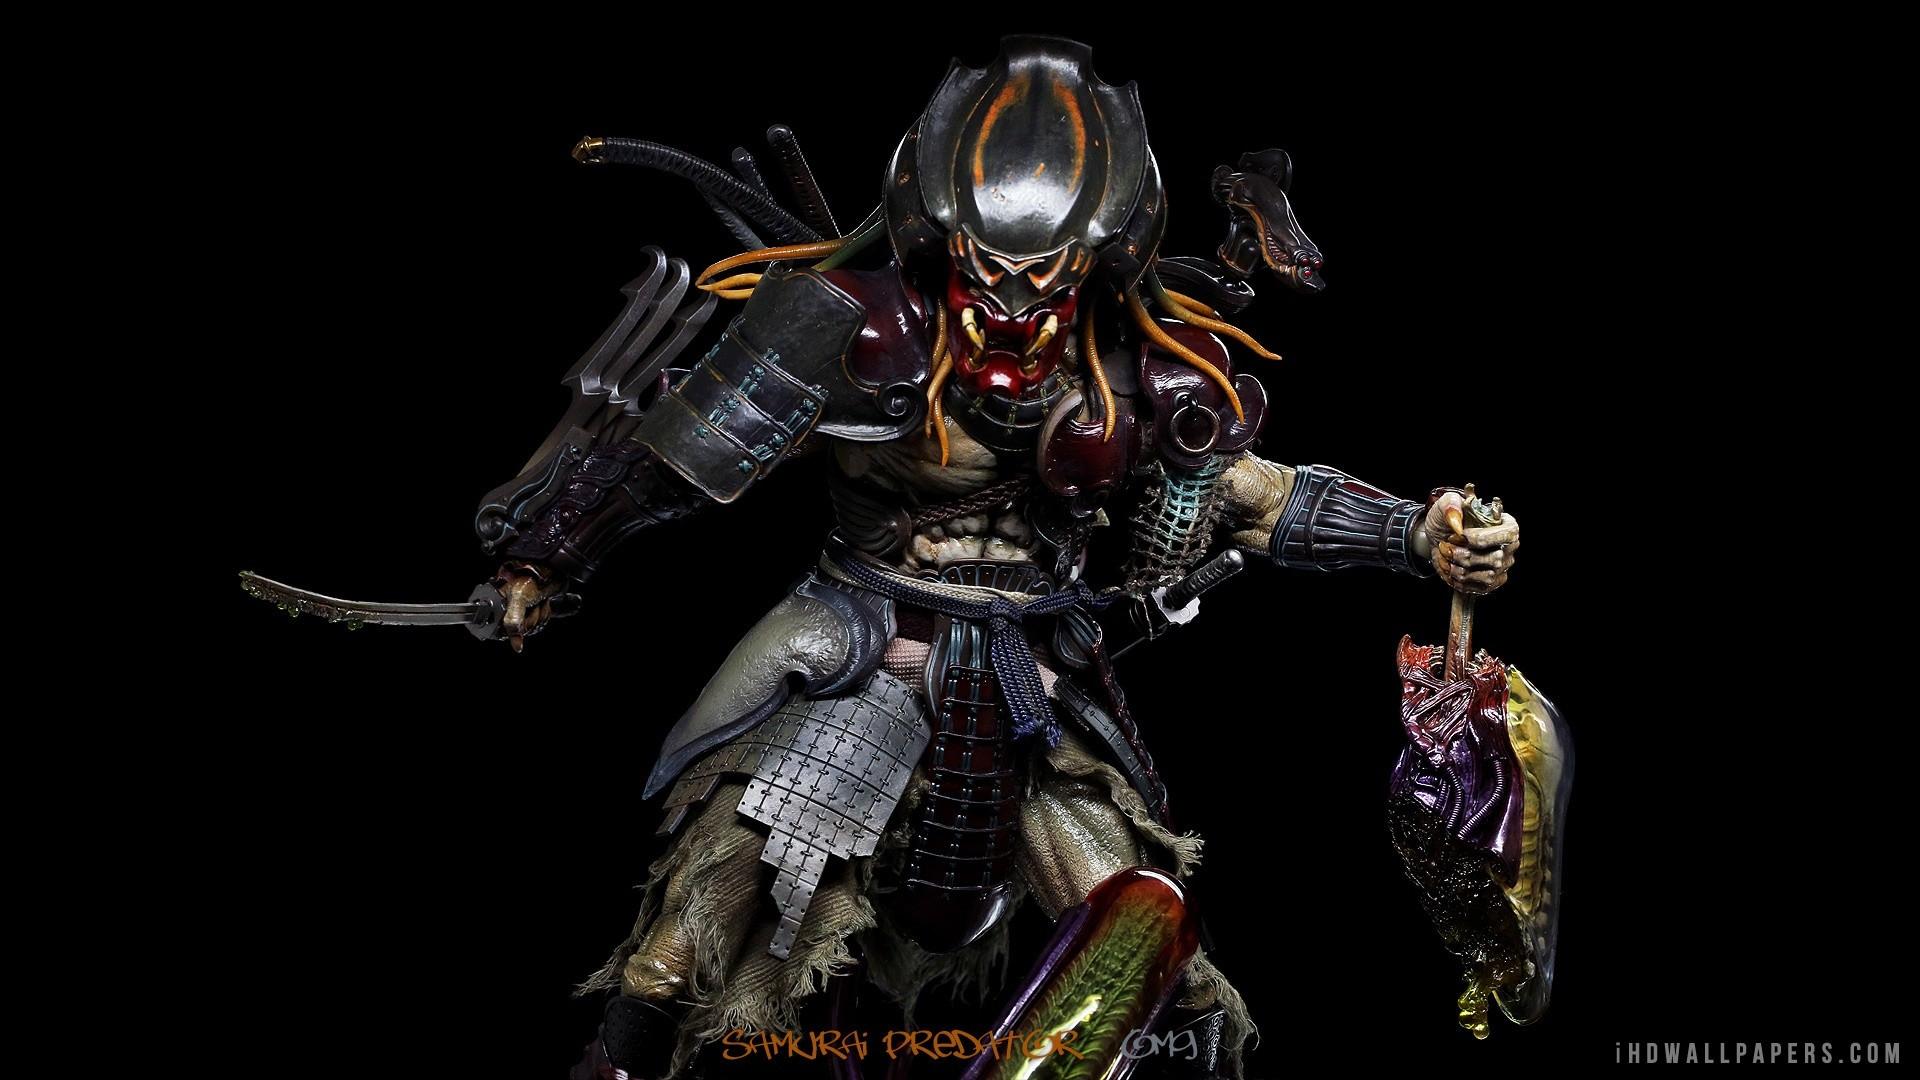 Res: 1920x1080, samurai masks artwork warriors conical hats  wallpaper 83712